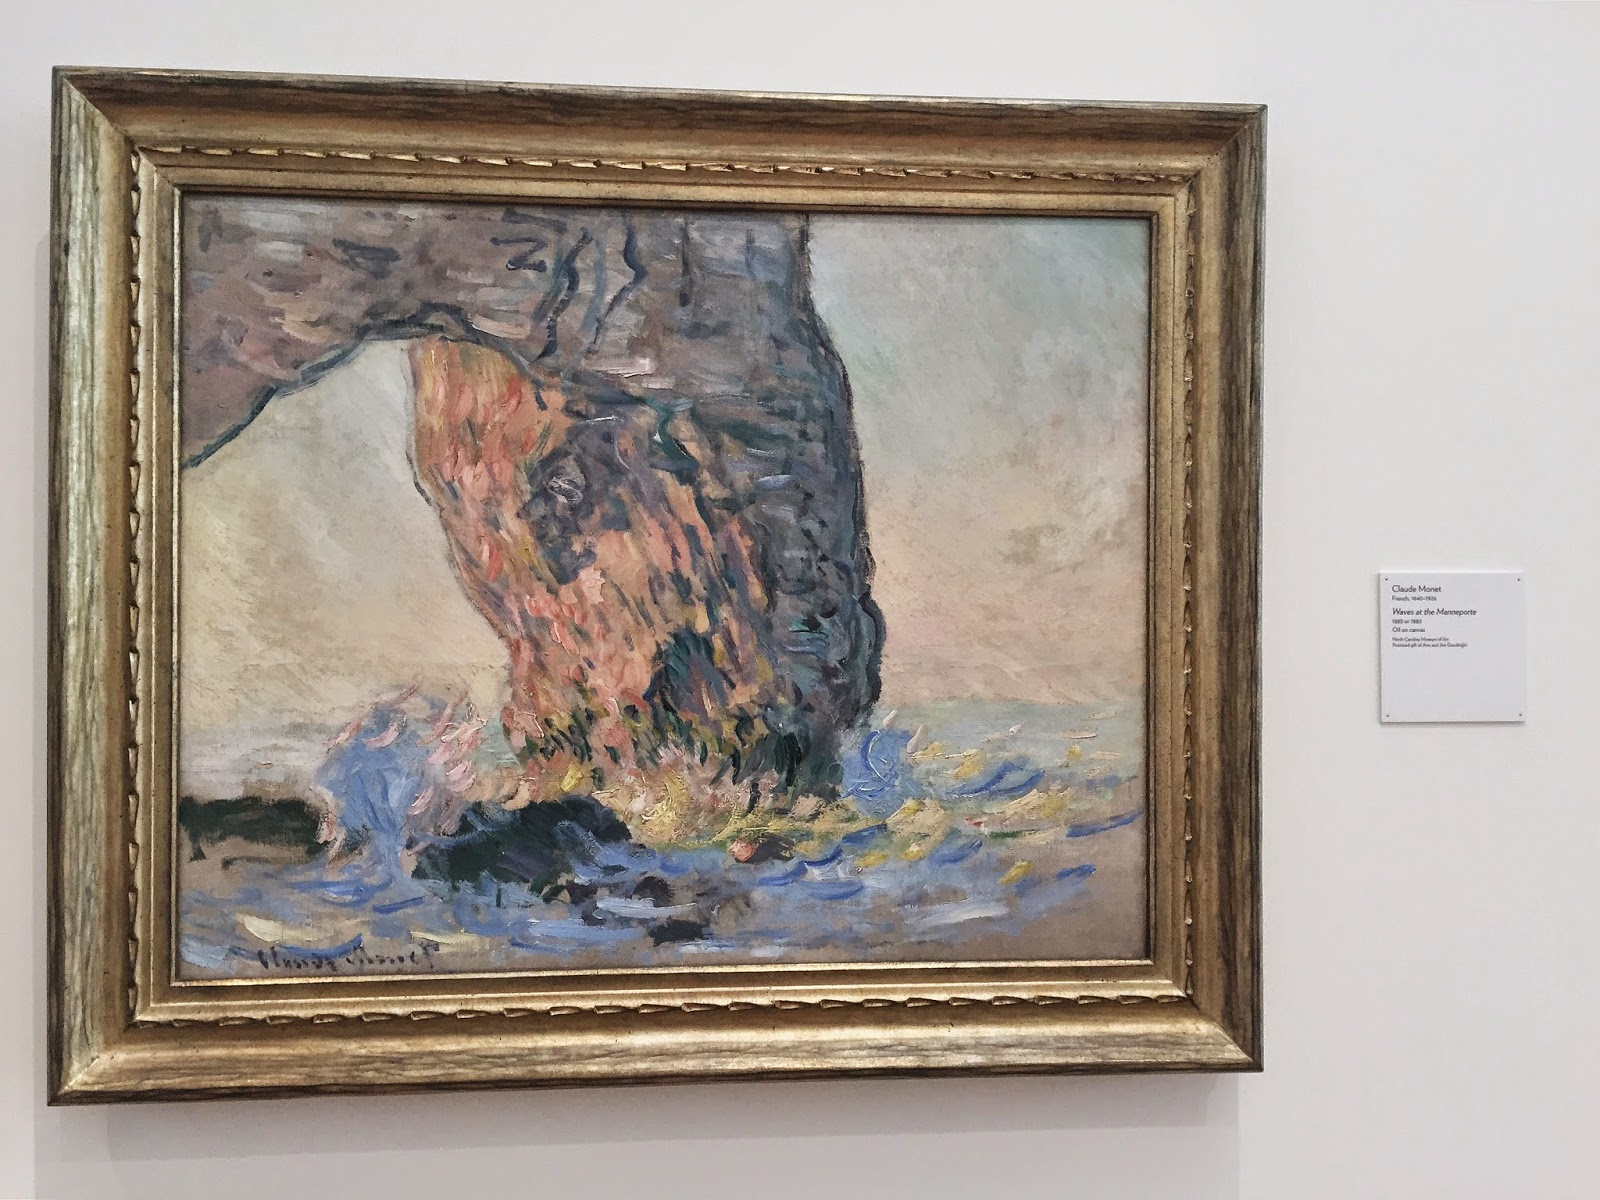 Claude Monet, North Carolina Museum of Art, NCMA, Raleigh, North Carolina, things to do in Raleigh, things to go in North Carolina, art, art museum